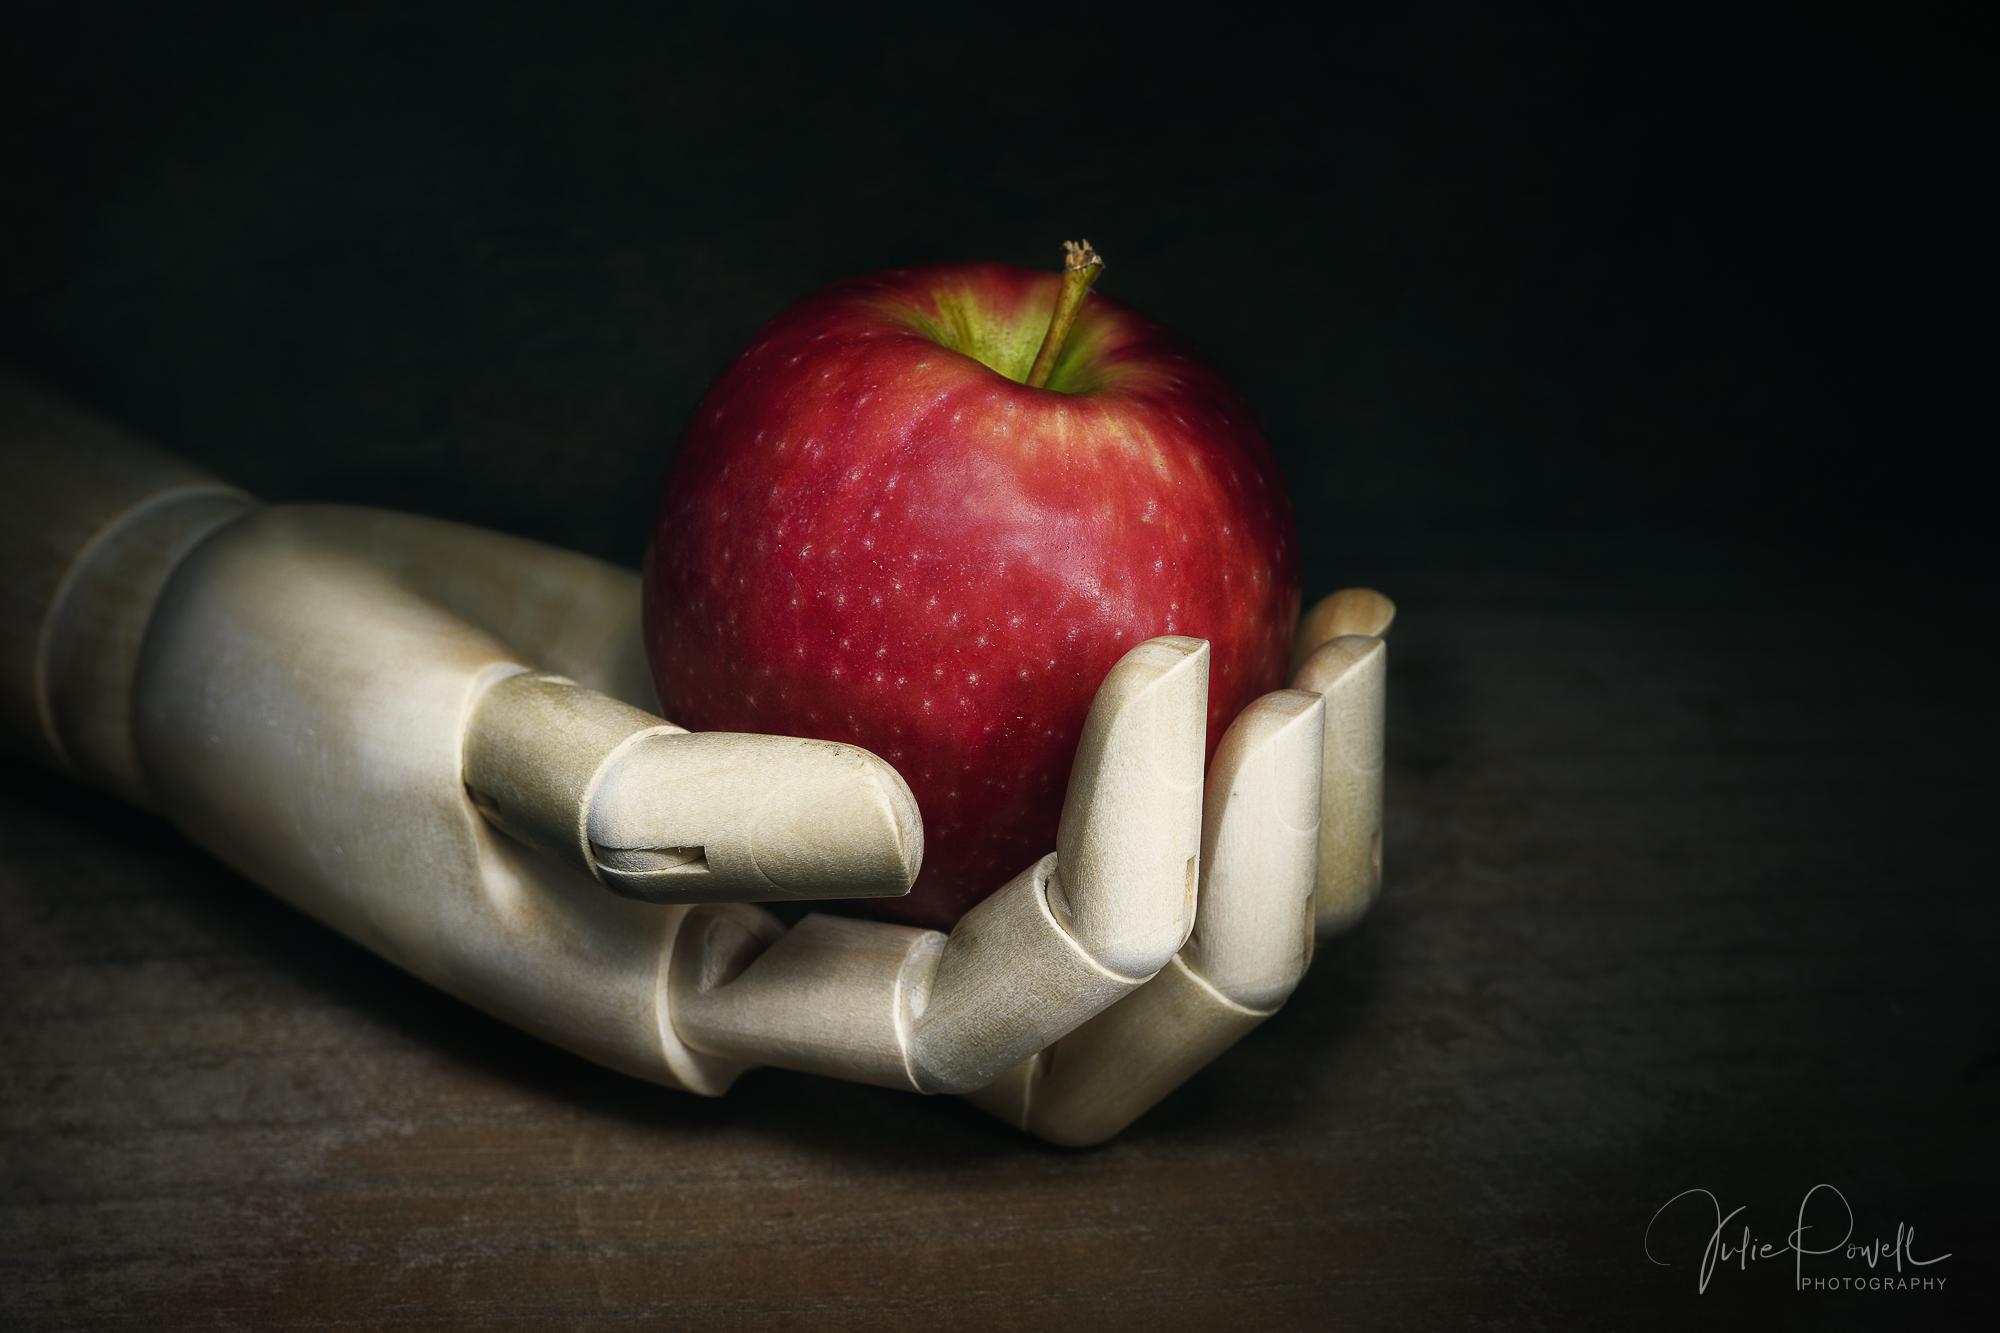 Julie Powell_Pinnochios Apple.jpg